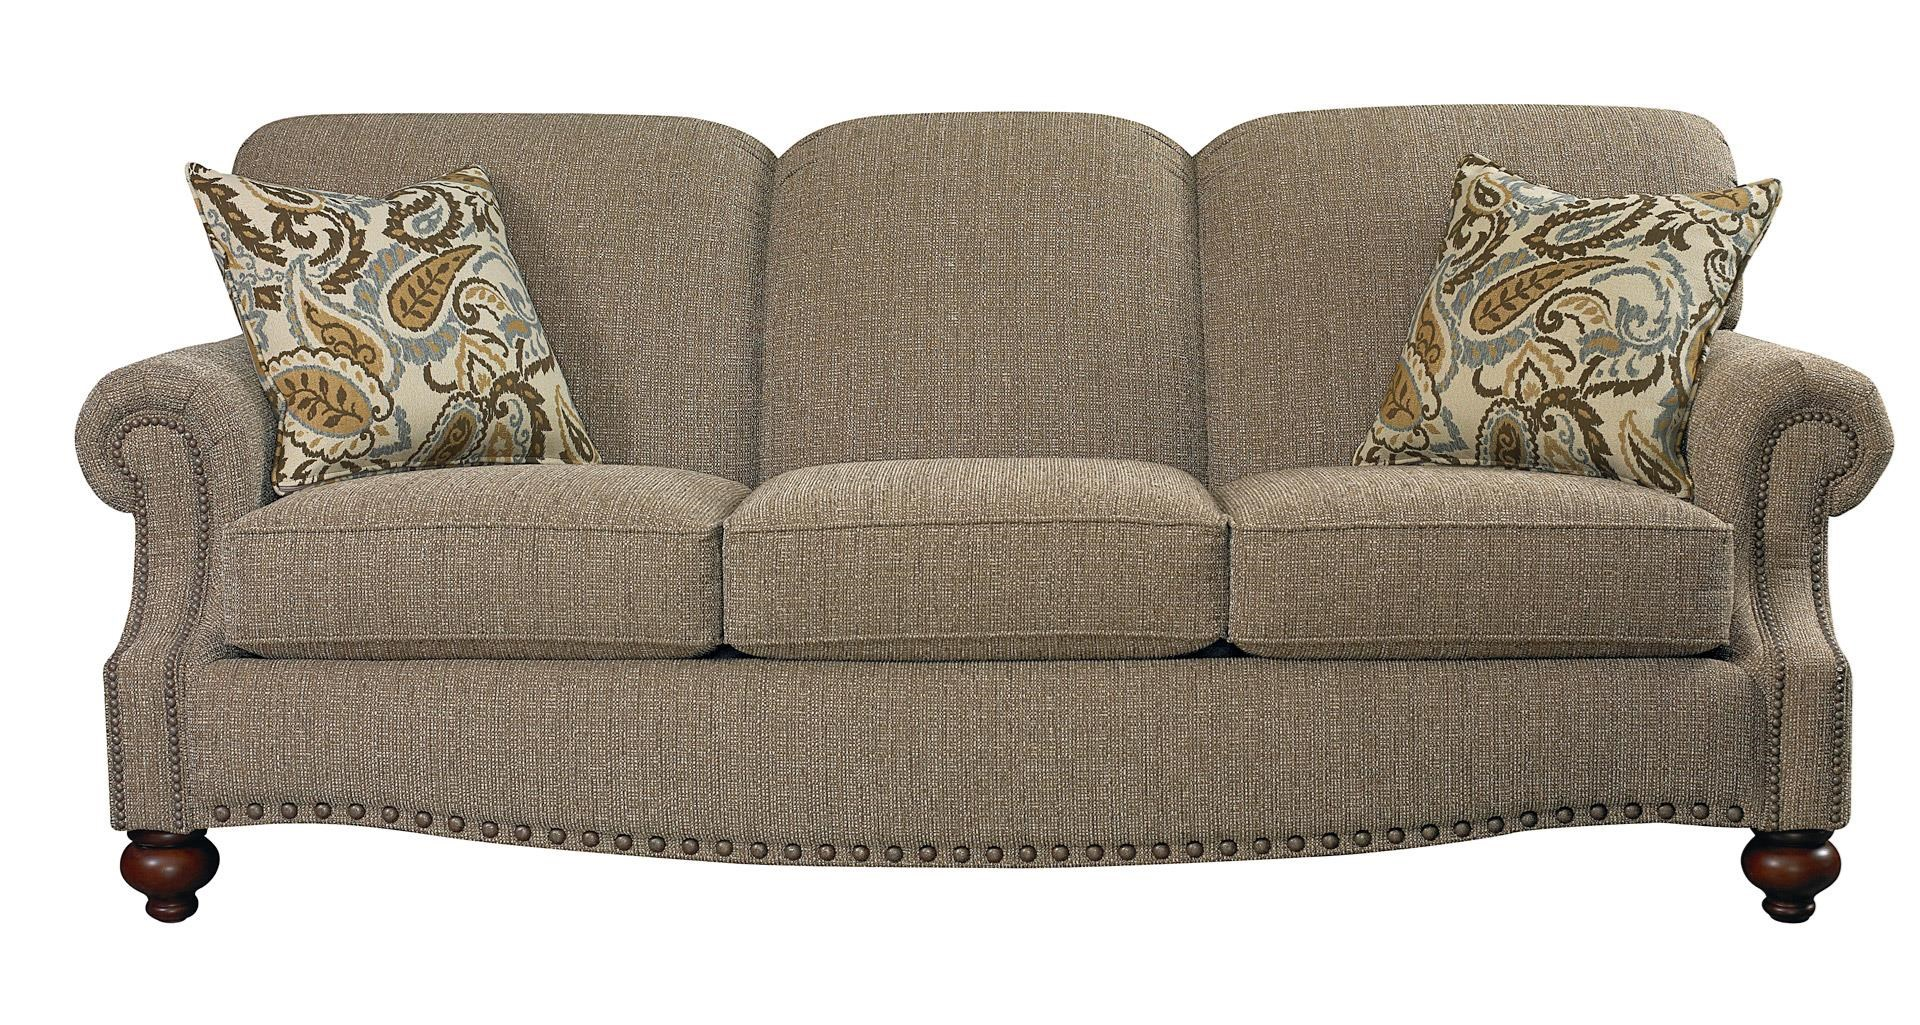 Bassett Club Room Sofa - Item Number: 3991-62FC 1474-8